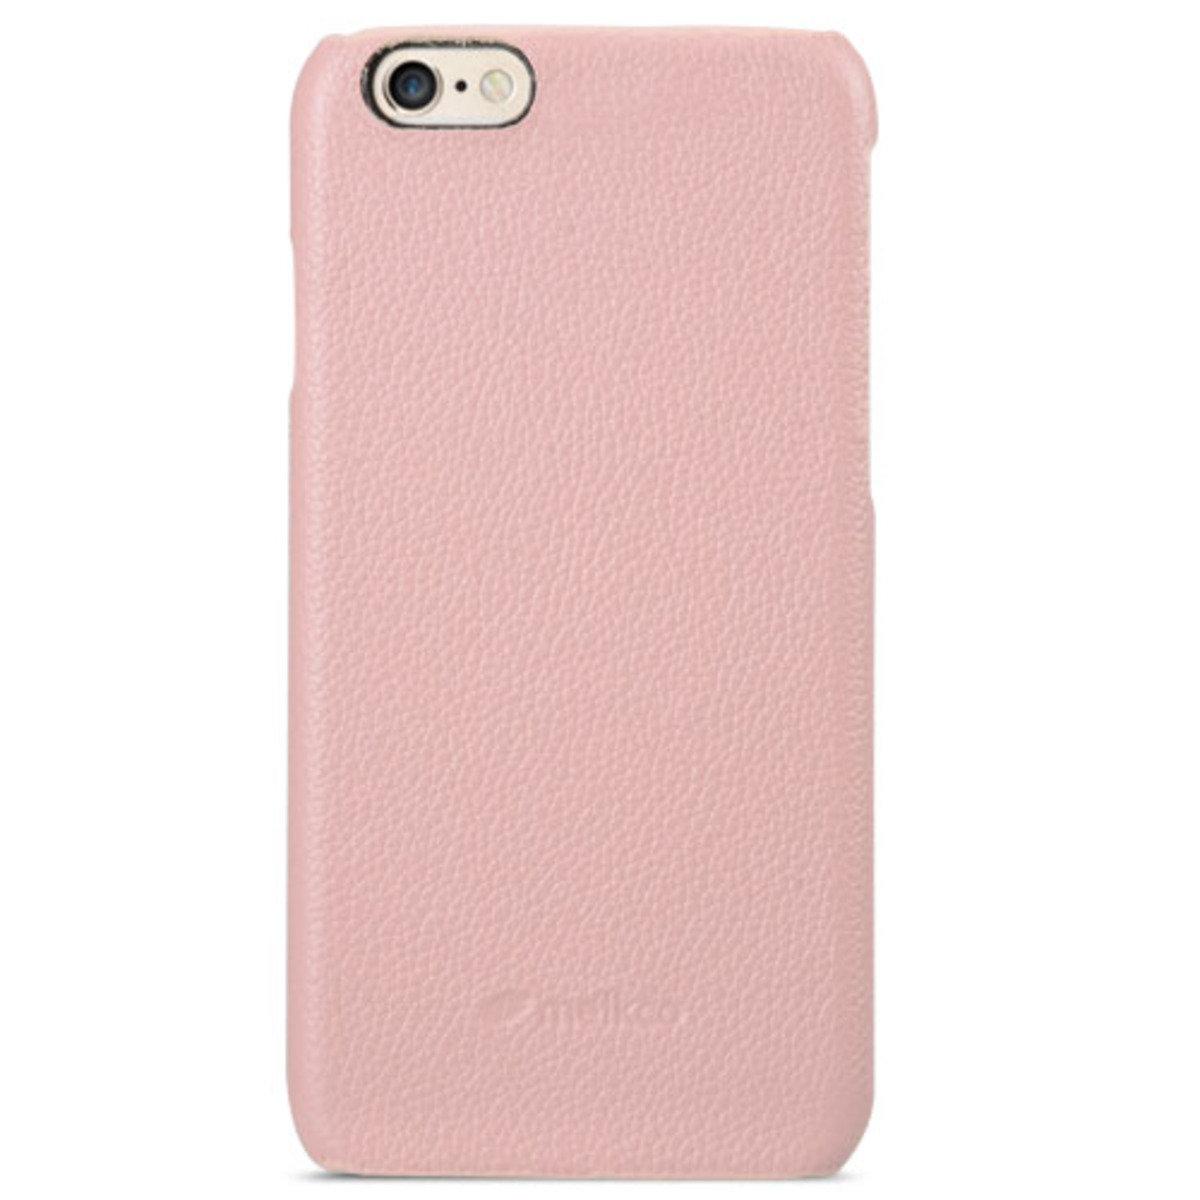 Apple iPhone 6  (4.7 inch) Snap Cover 高級真皮革手機套 - 粉紅色